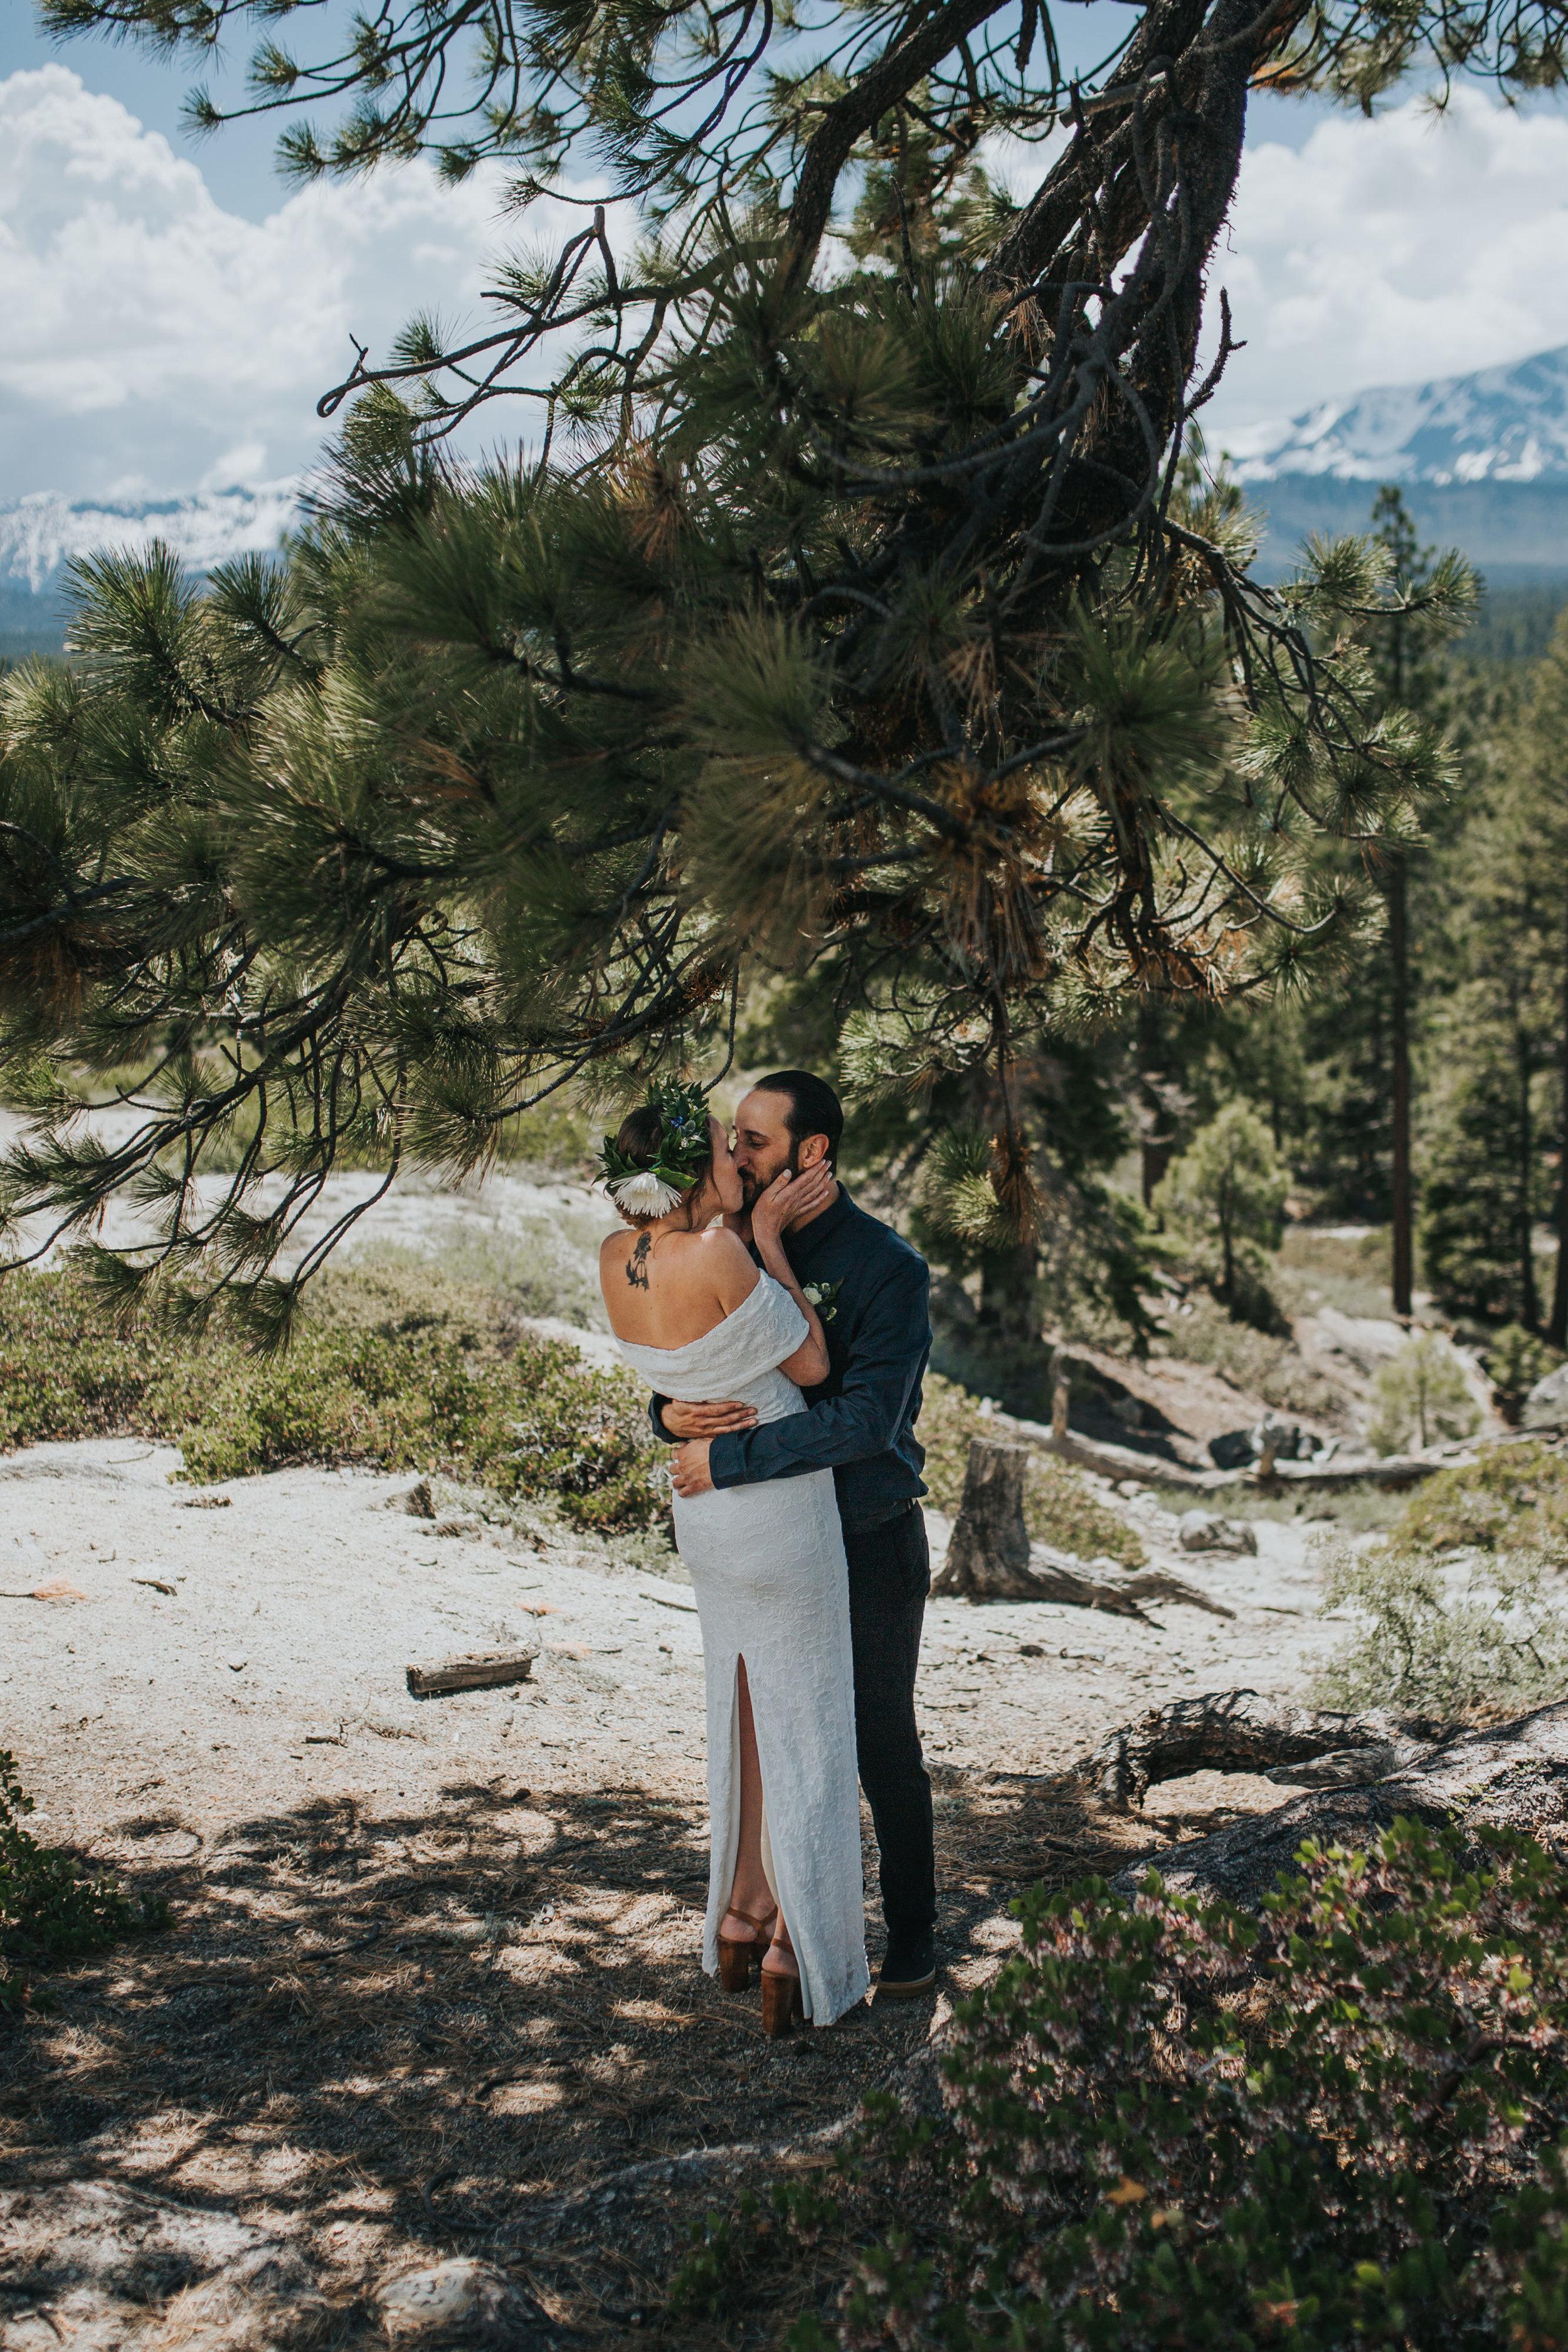 south-lake-tahoe-elopement-valerie-lendvay-photo-012.jpg